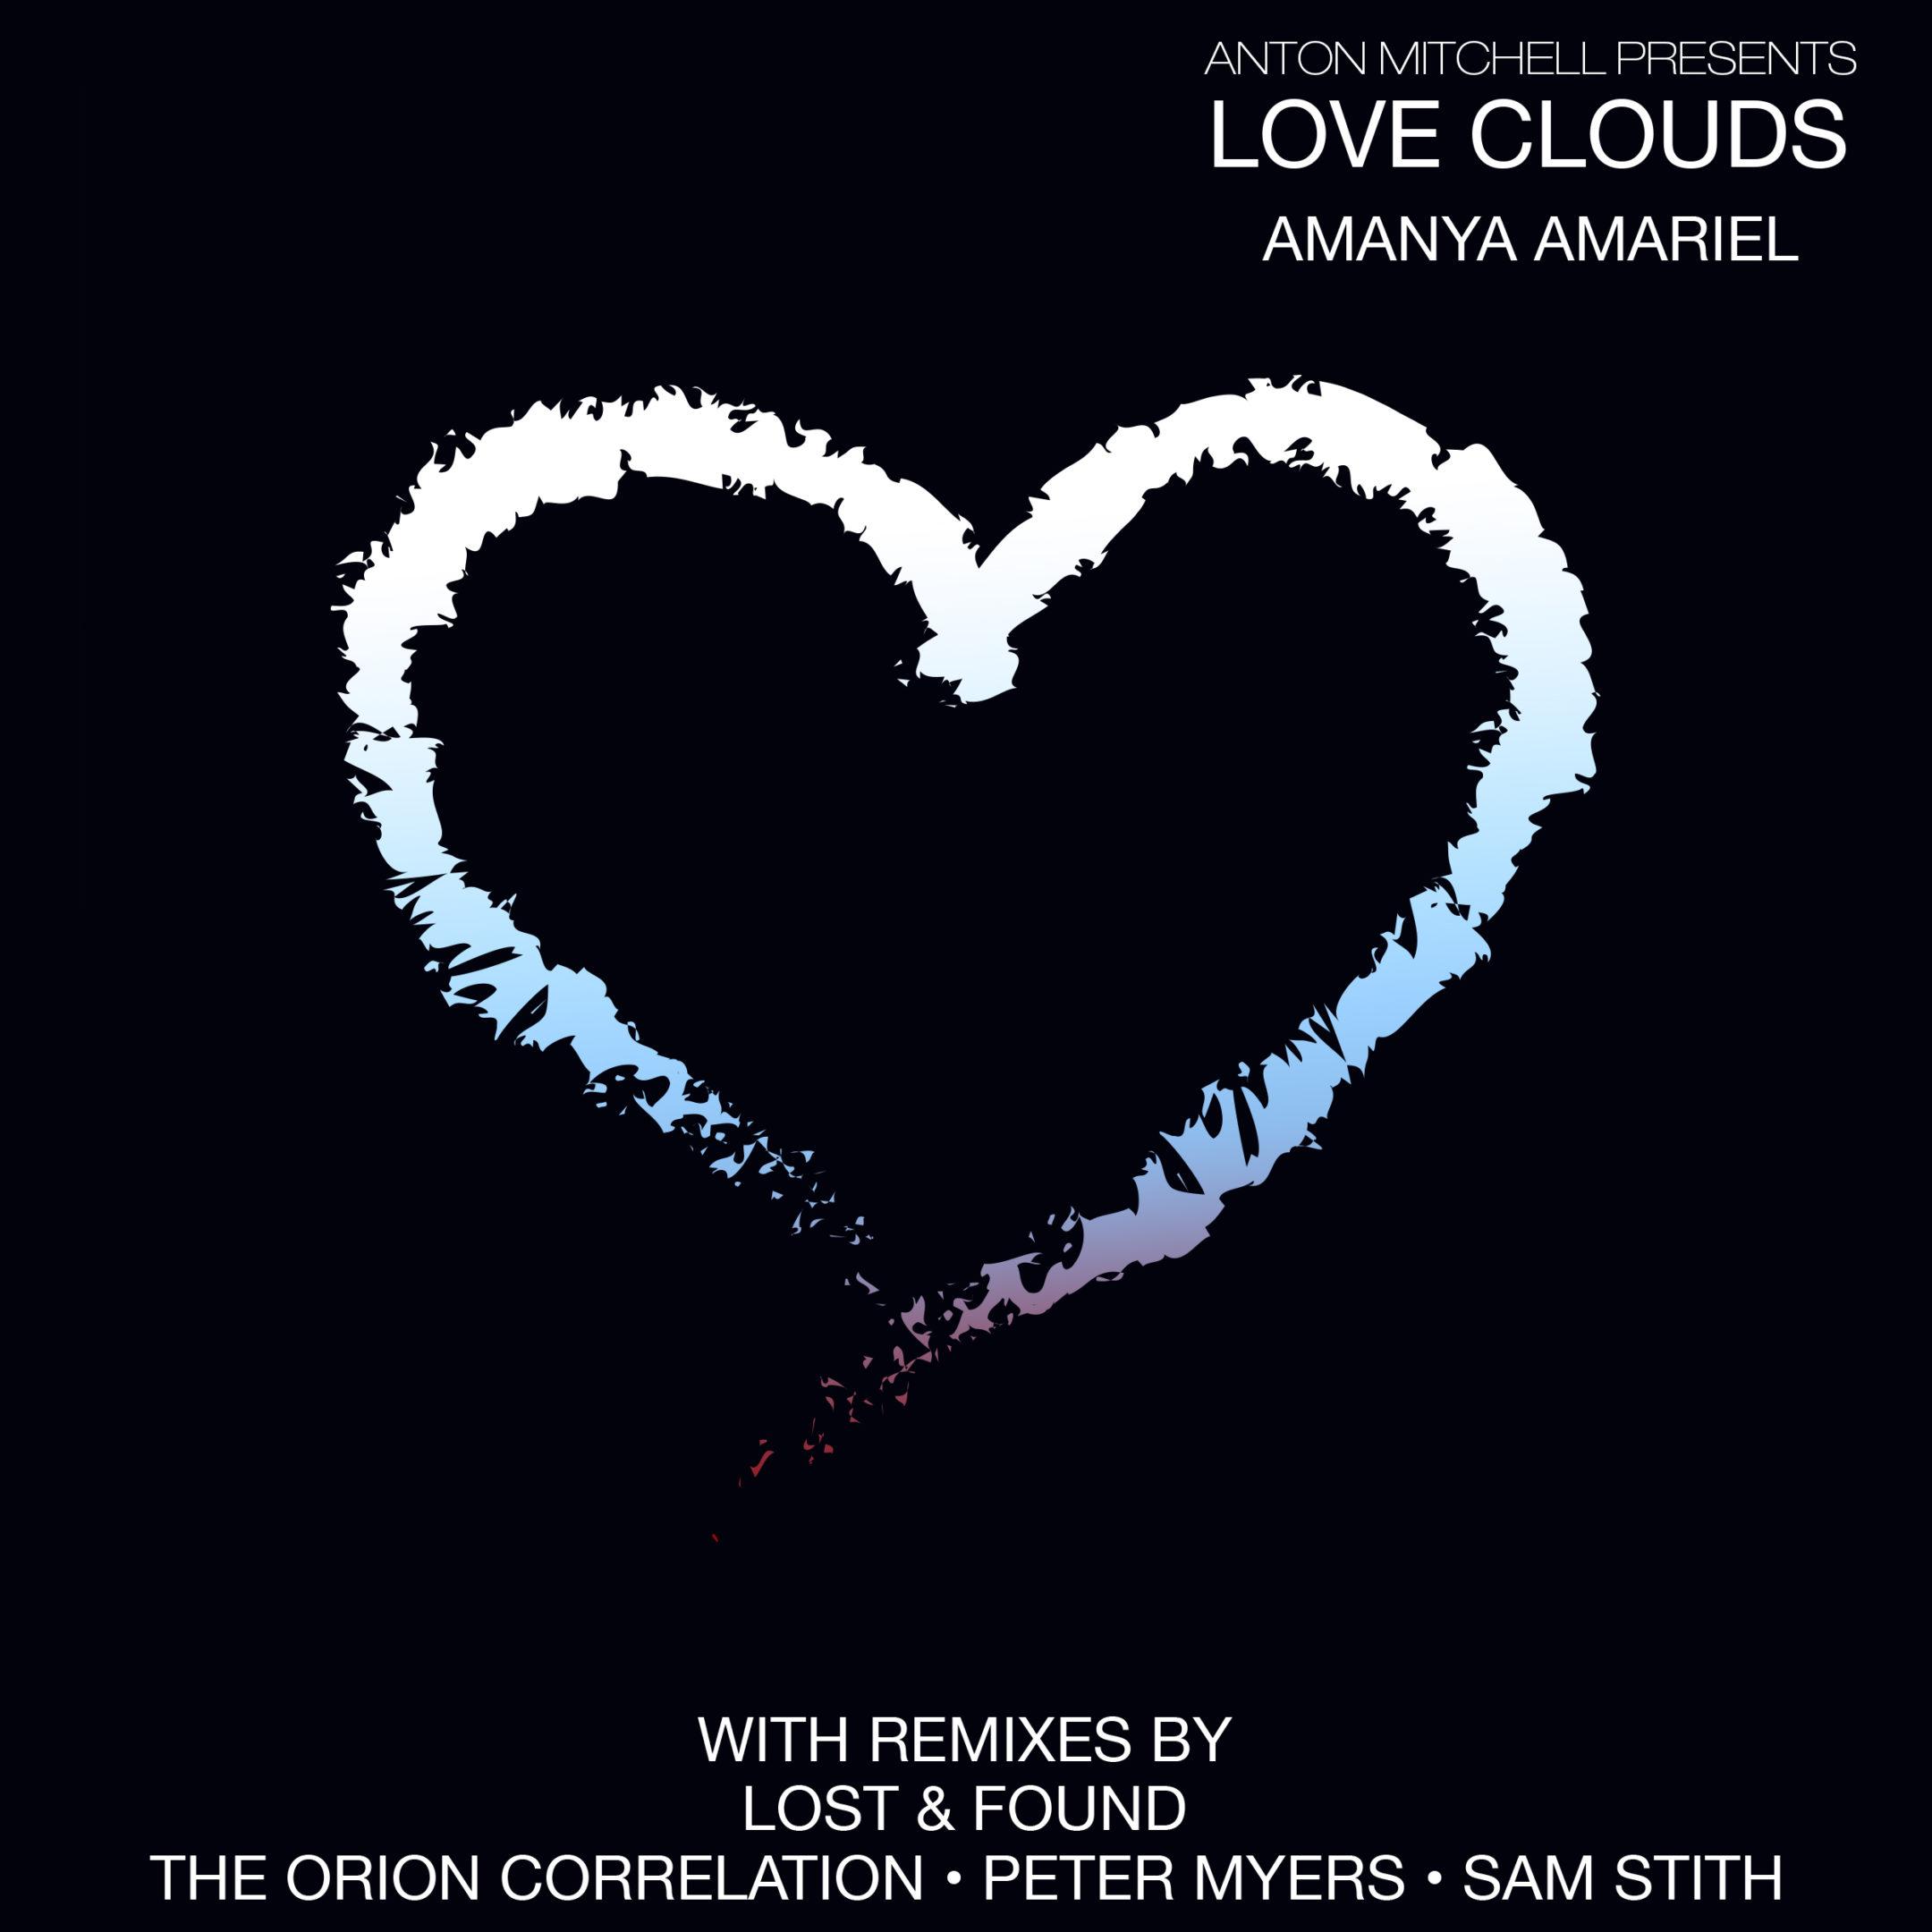 Amanya Amariel - Love Clouds (Artwork)